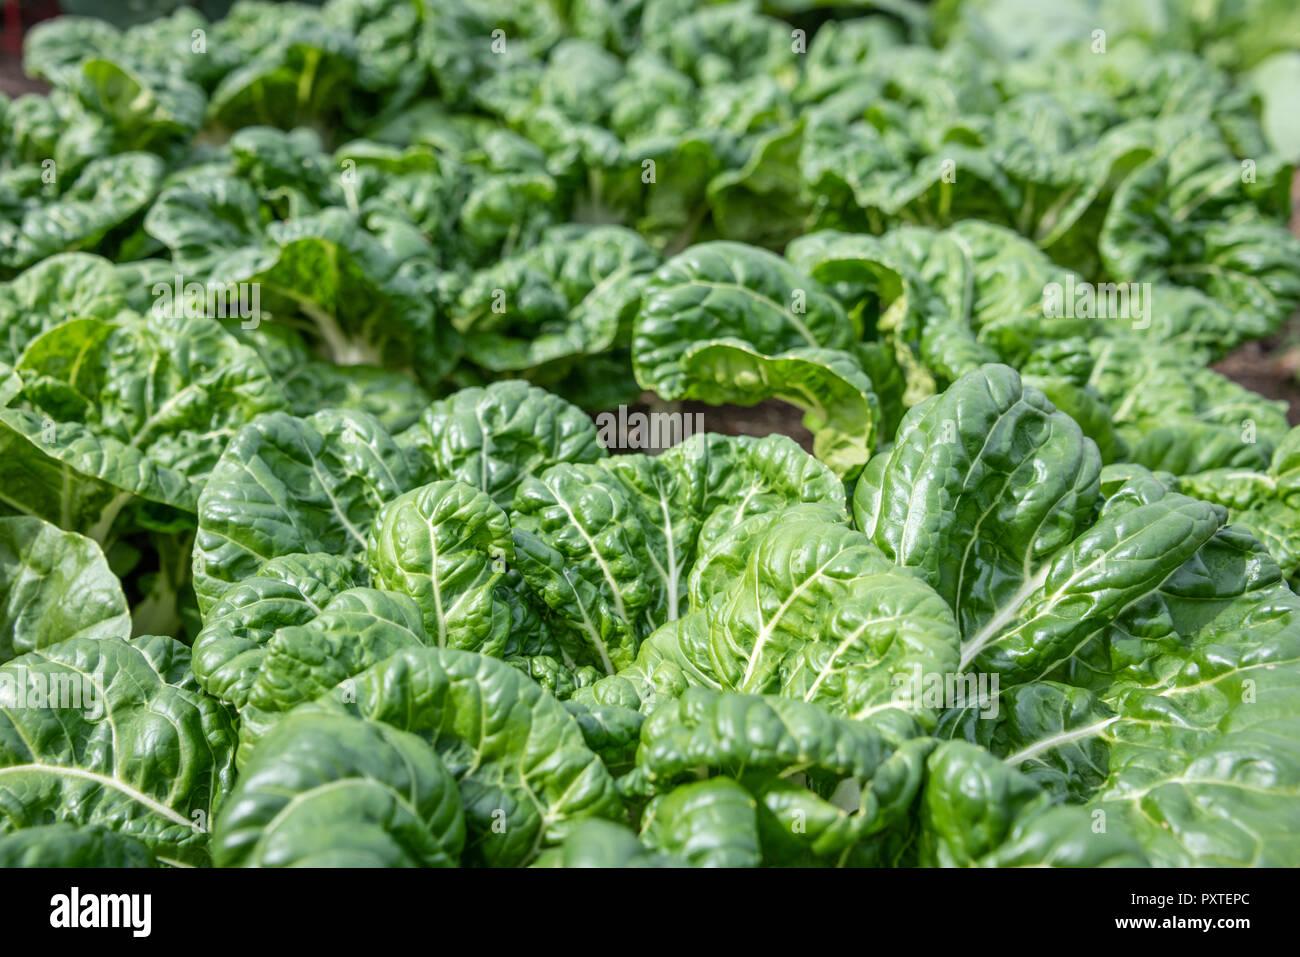 Bok choy growing in a community garden in Metro Atlanta, Georgia. - Stock Image